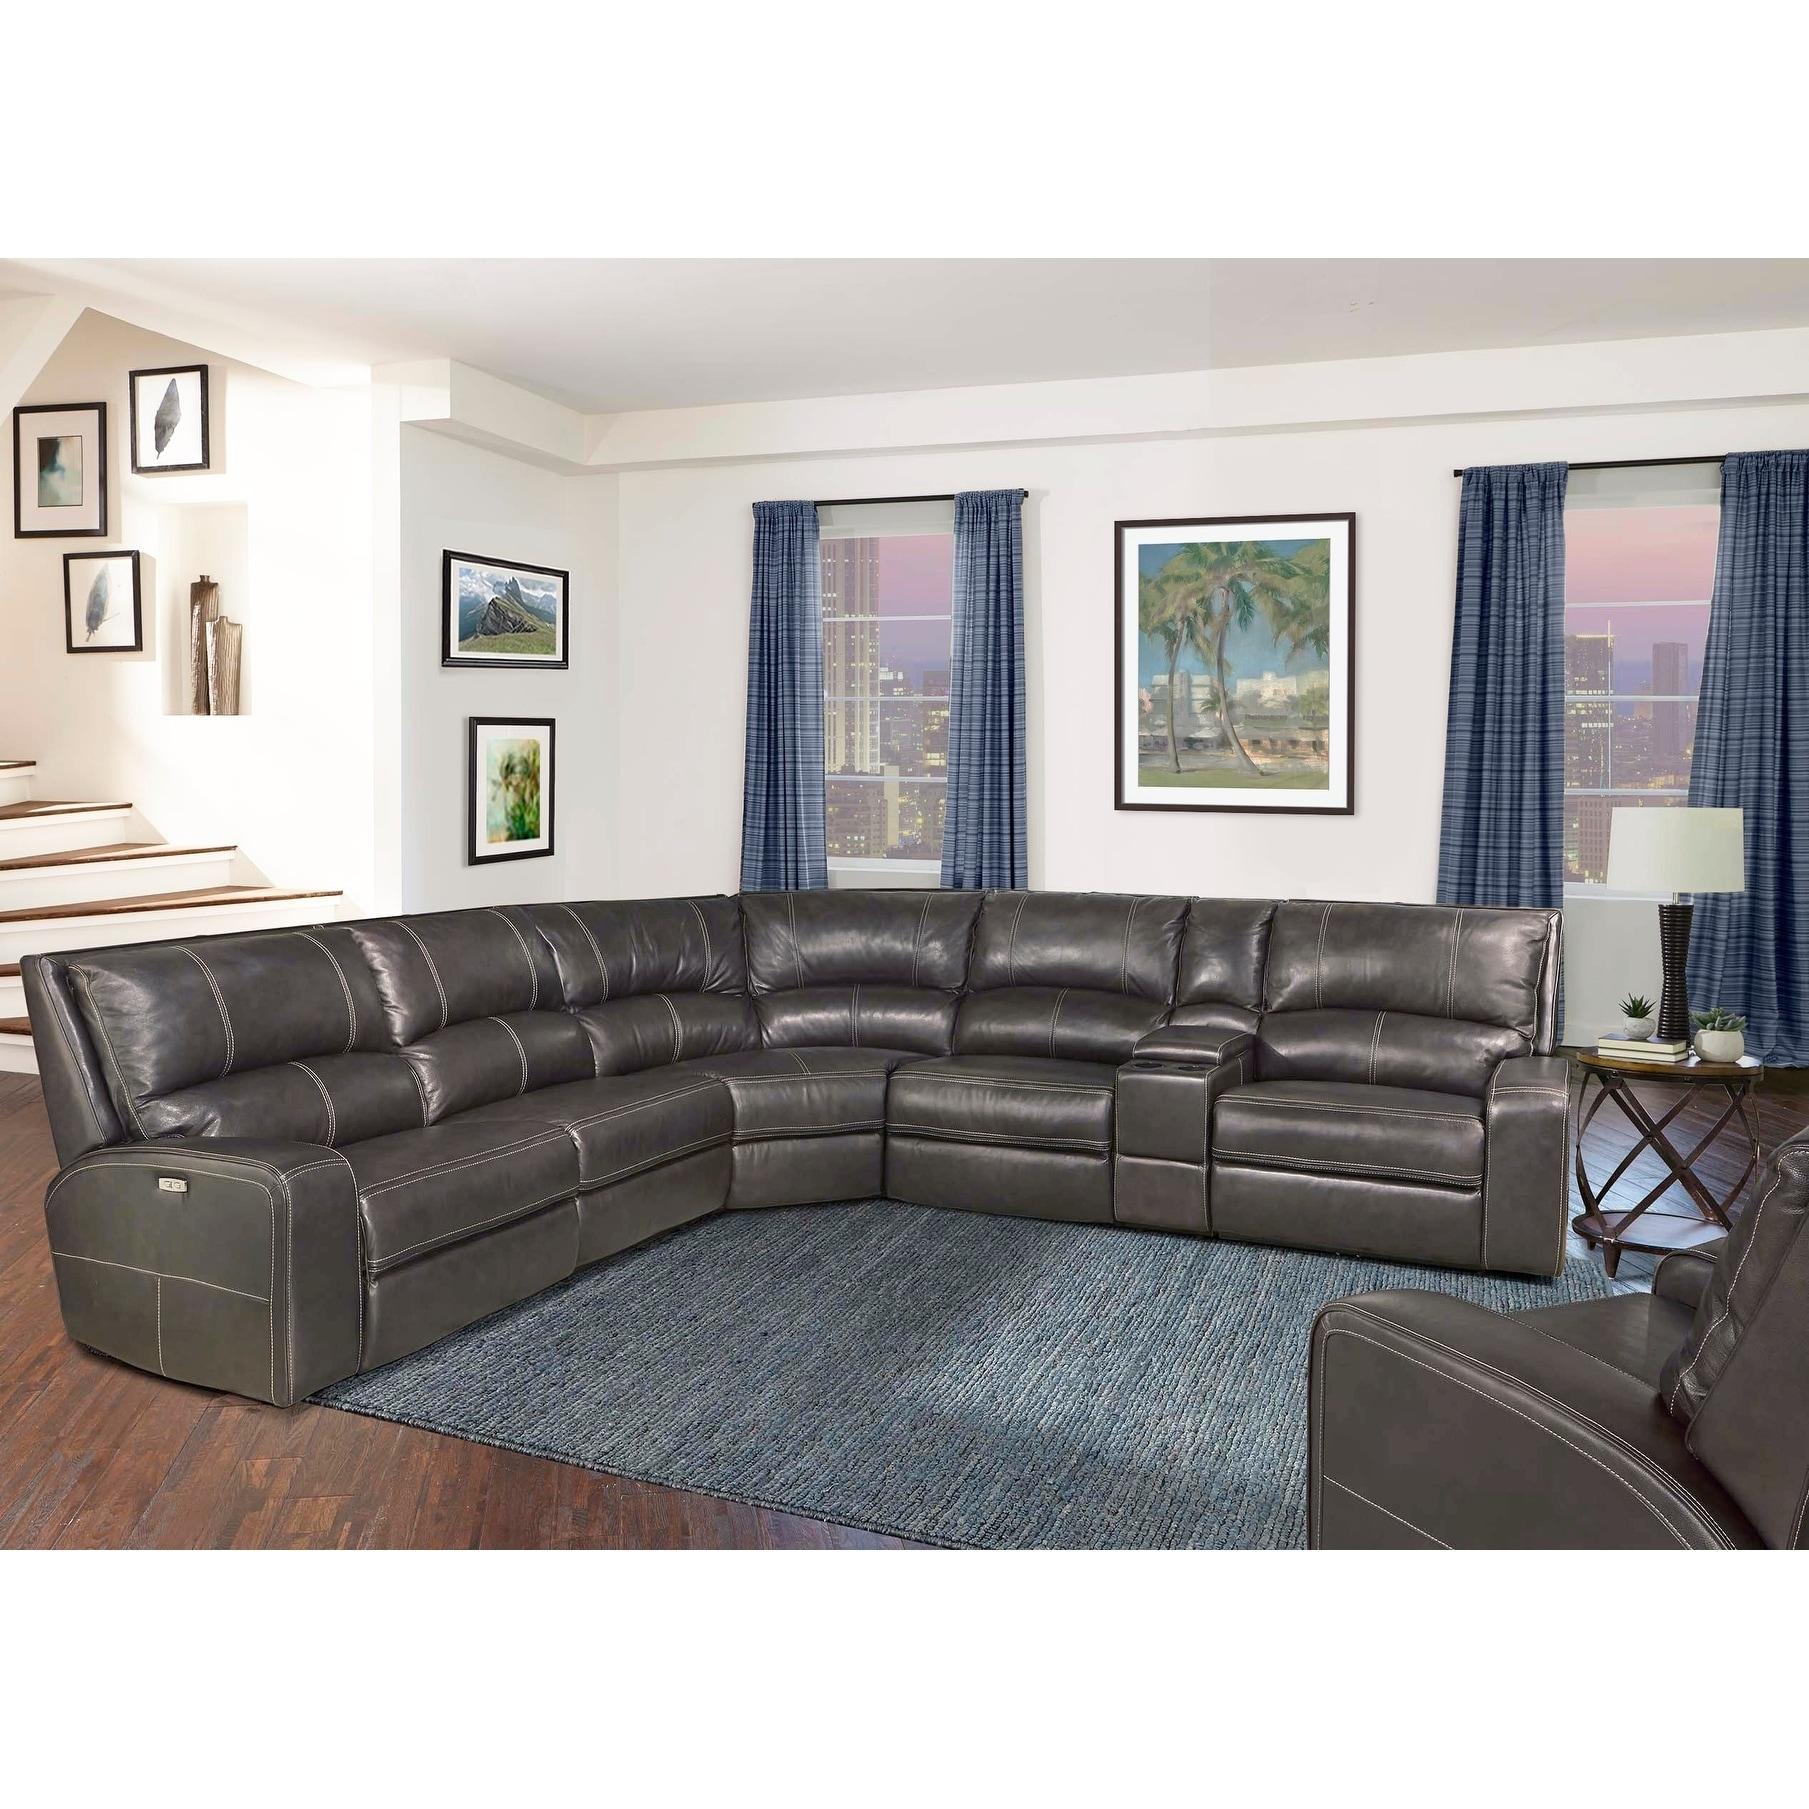 Shop Symon Grey Top Grain Leather Power Reclining Sectional Sofa ...